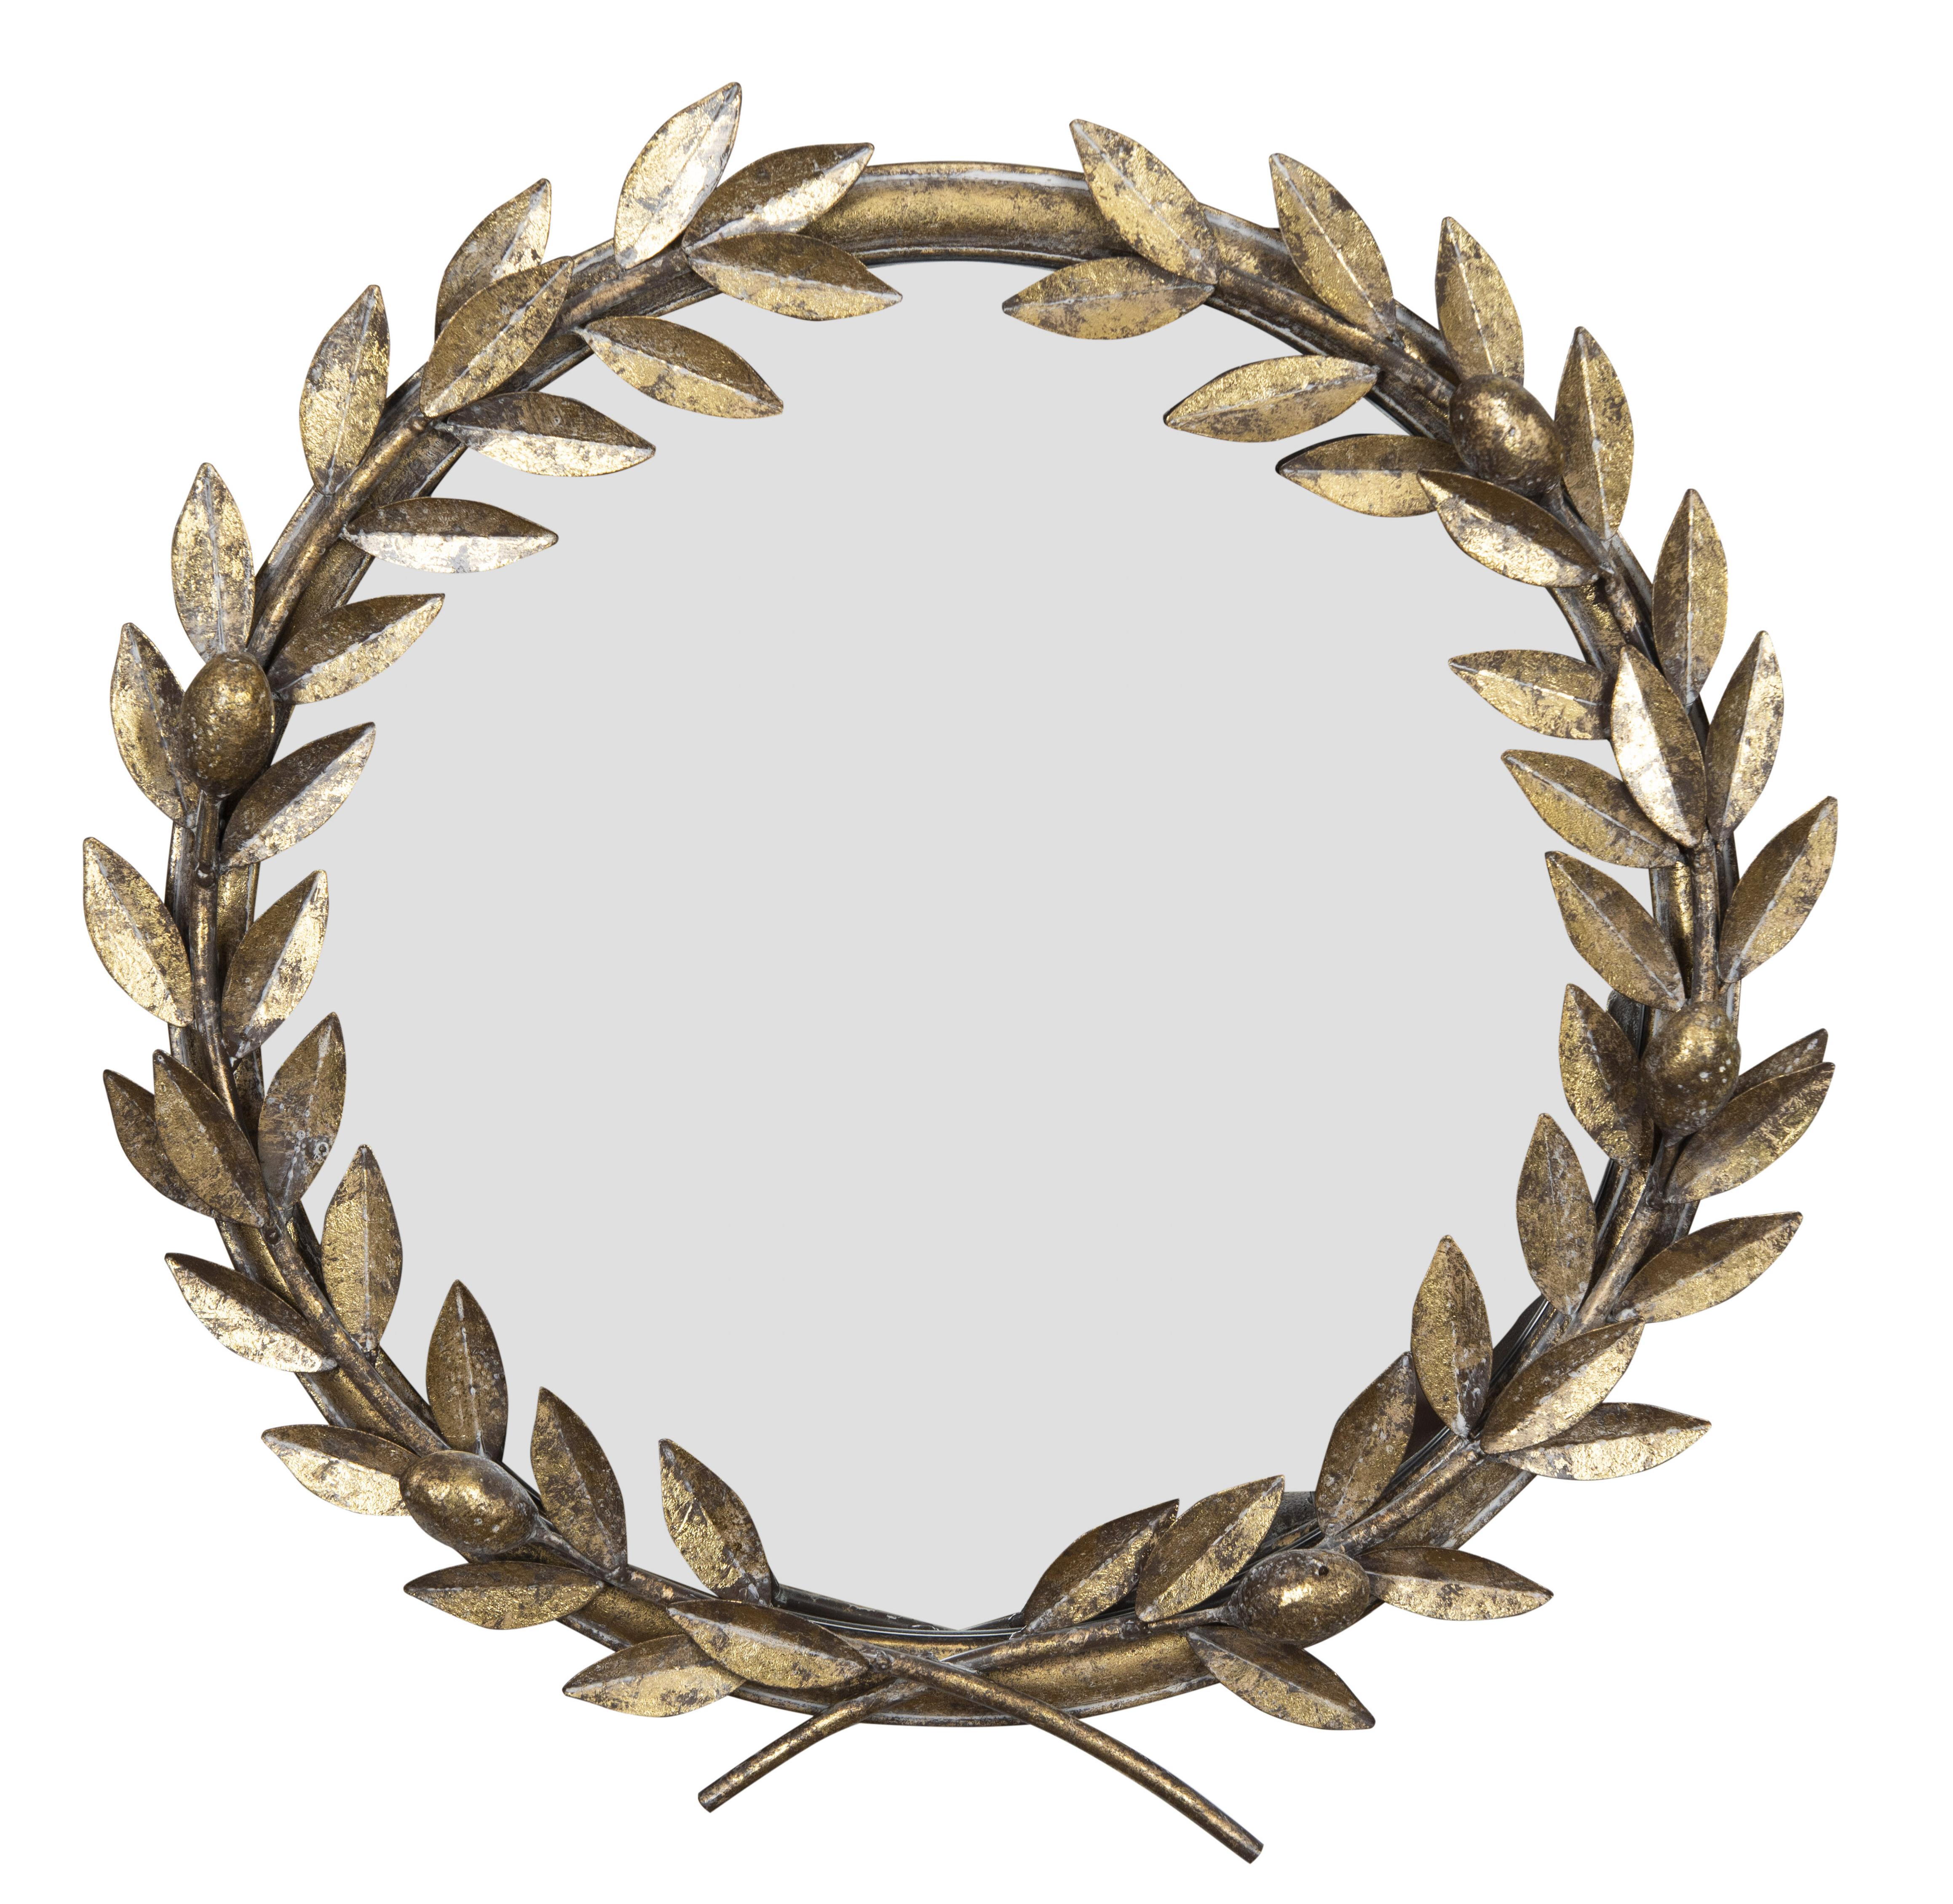 Latest Kaelin 5 Piece Dining Sets Regarding Kaelin Round Laurel Wreath Industrial Accent Mirror (View 14 of 25)